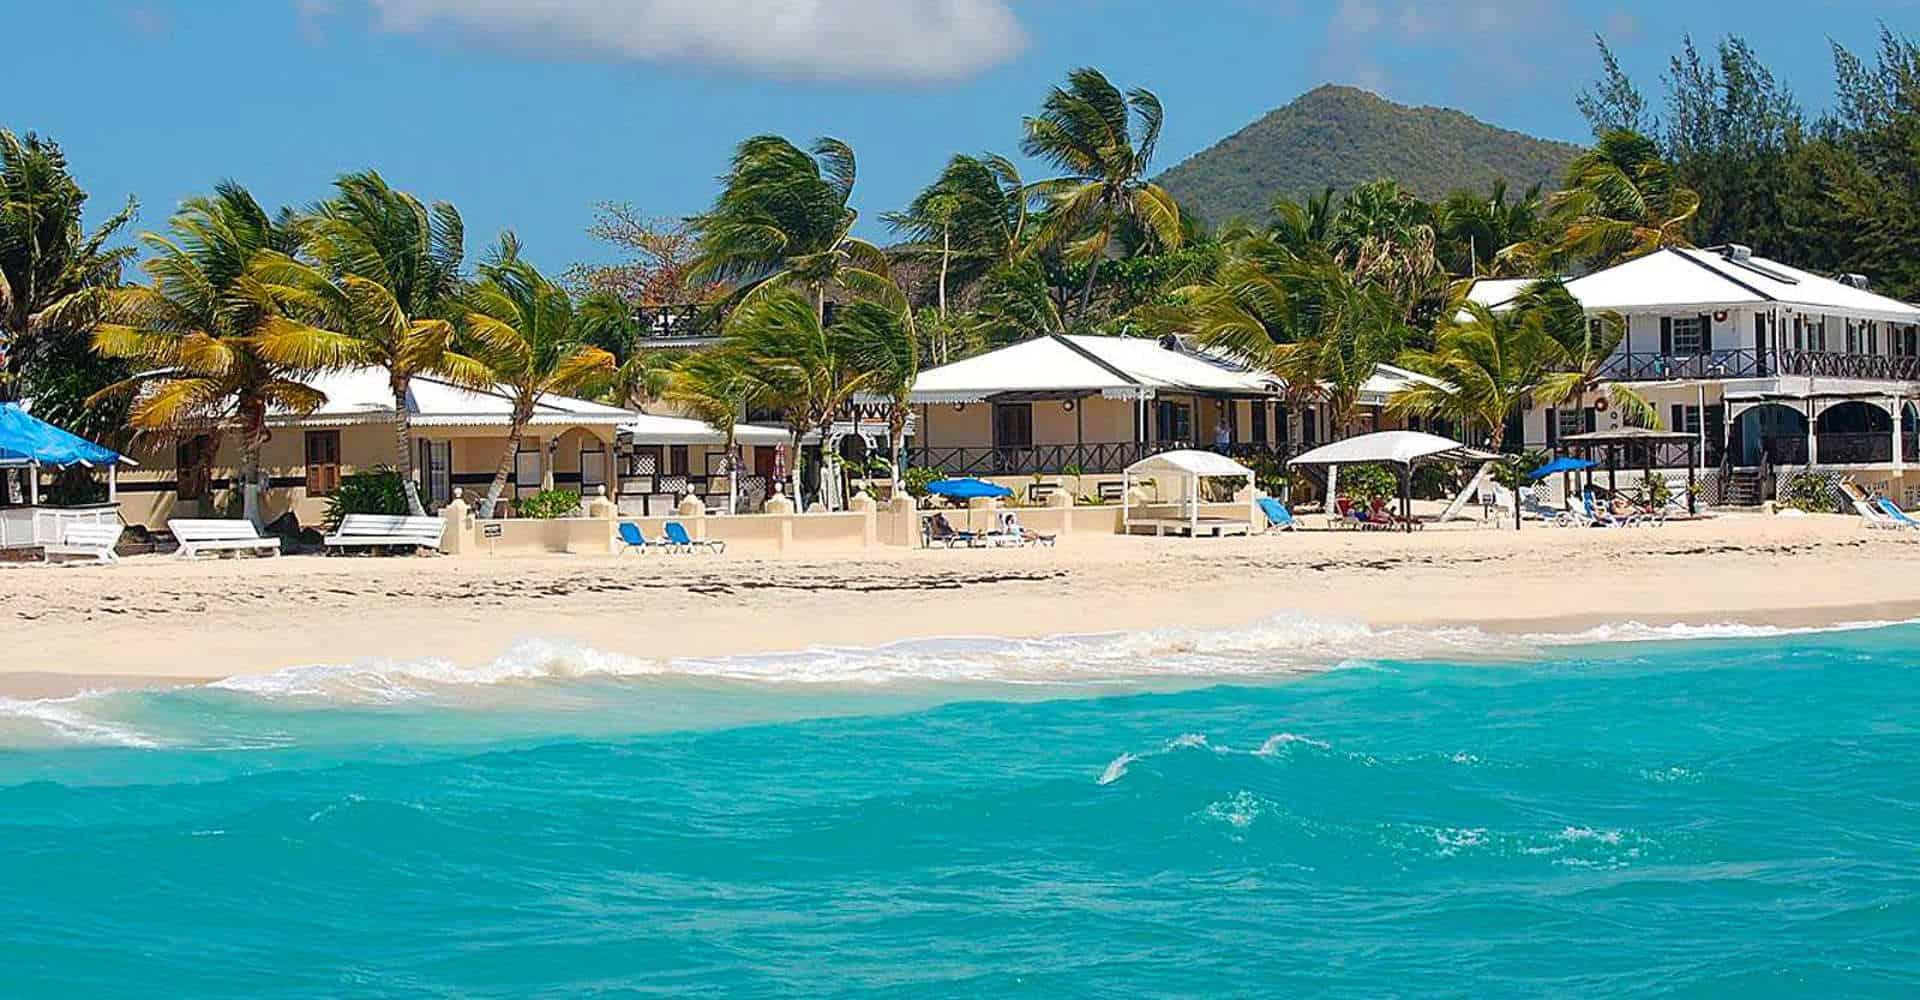 St. Maarten - St-Martin Portal - MARY'S BOON BEACH RESORT ...